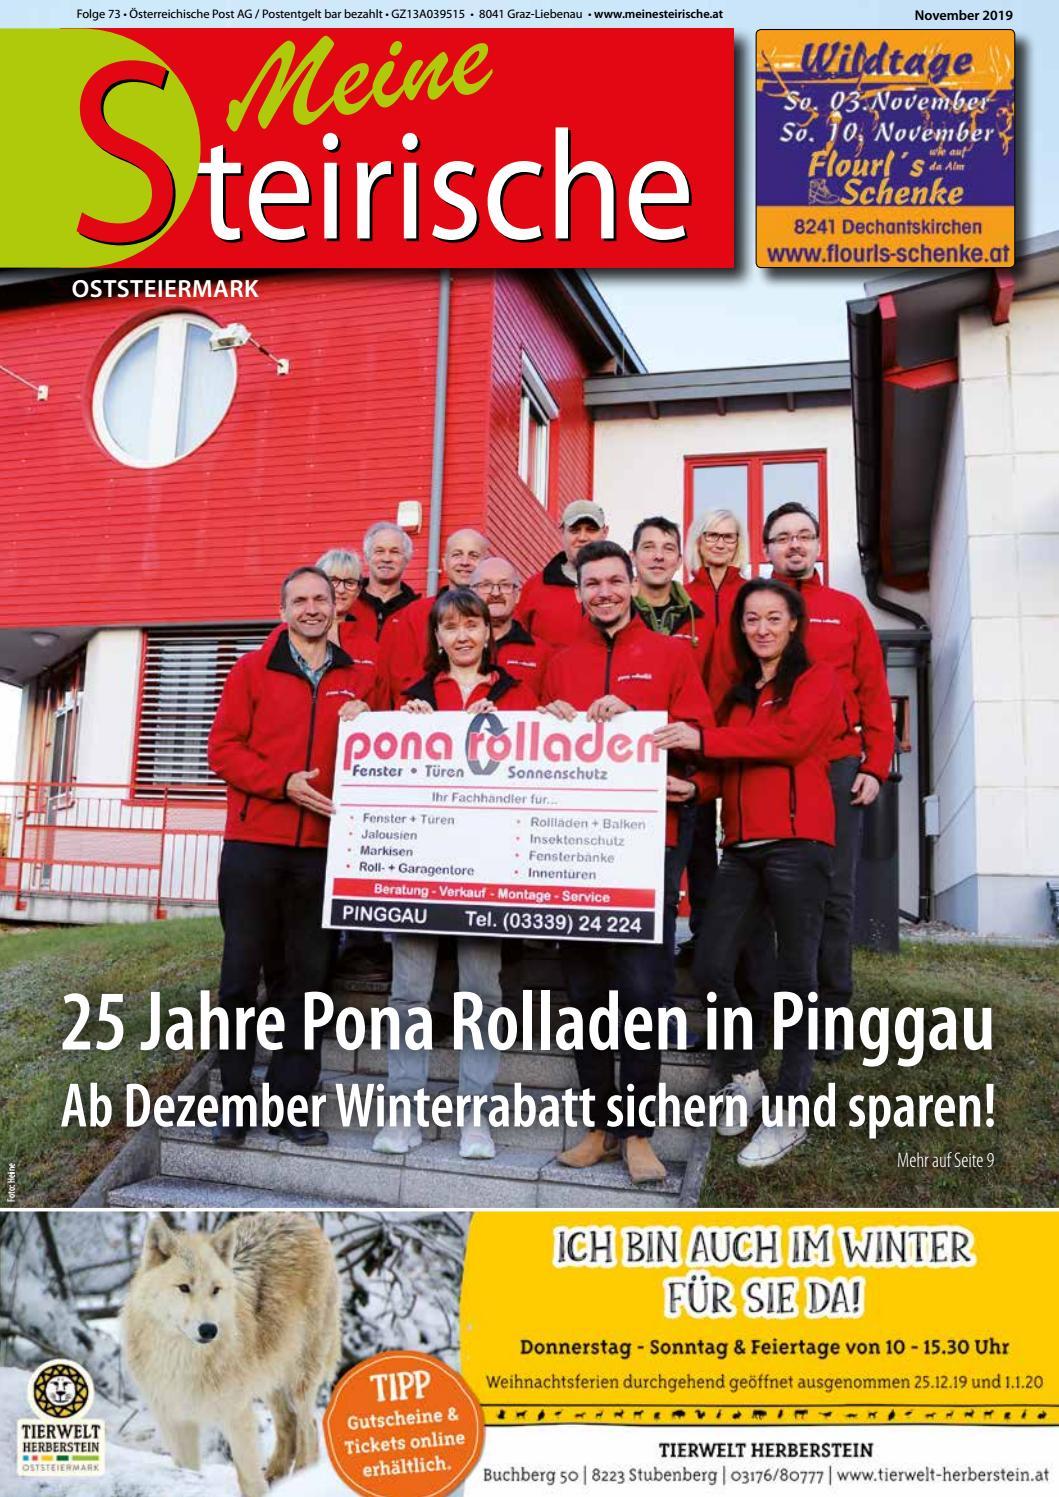 Fickkontakte aus Pinggau, Kontaktanzeigen (1) - Gratis